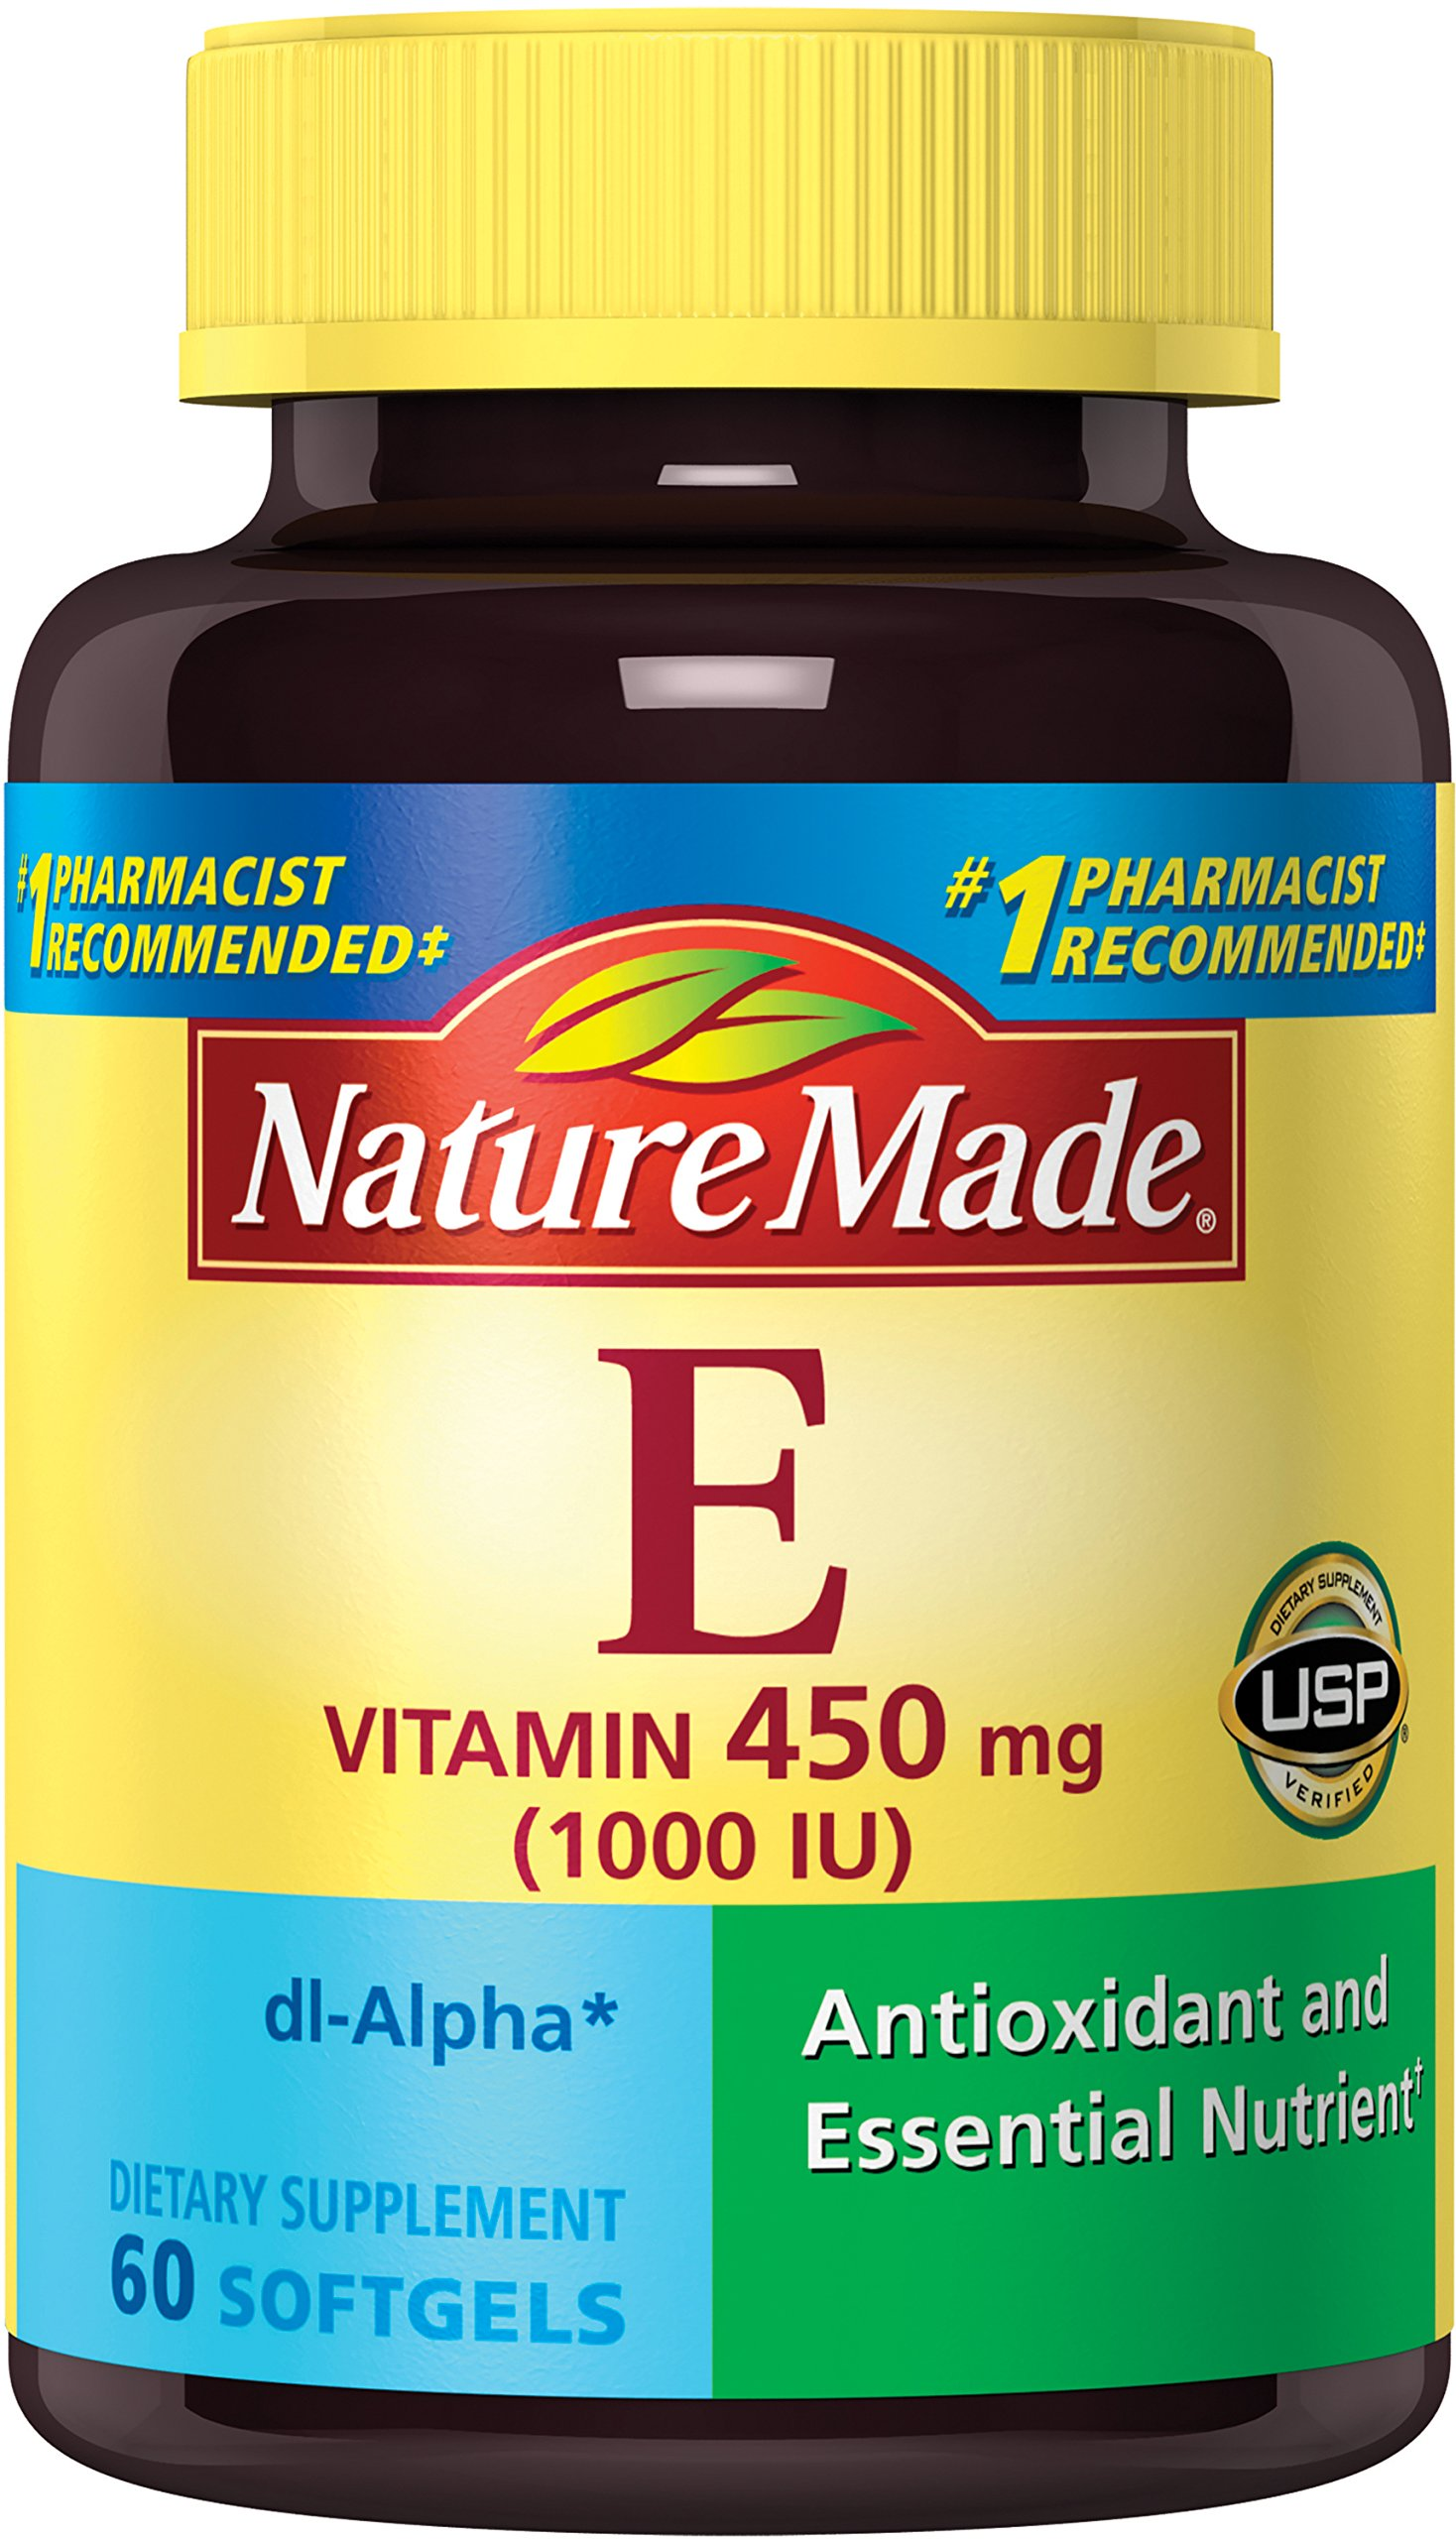 Nature Made Vitamin E 1000 IU (dl-Alpha) Softgels (Pack of 3)